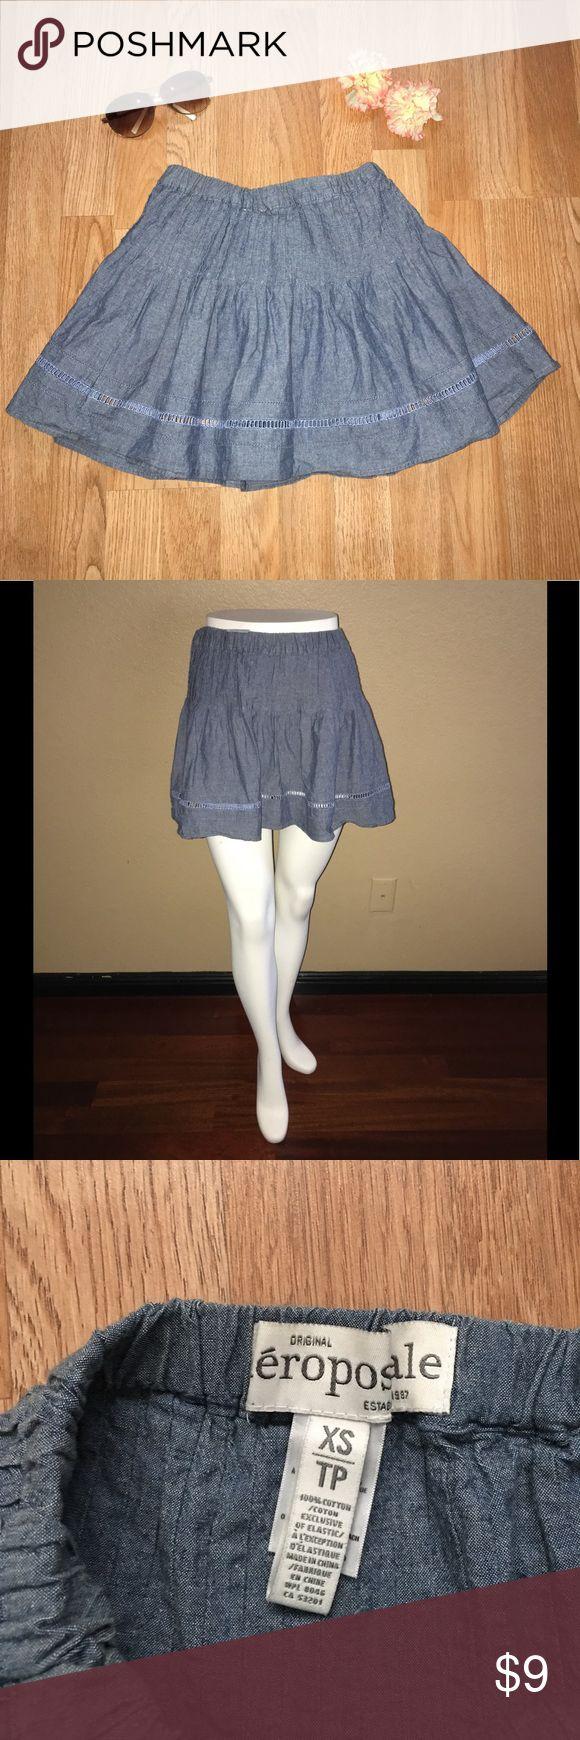 "Aeropostale Women's pleated mini skirt Excellent condition. SIZE XS. Stretchy waist. 100% cotton. Waist laying flat = 13"" across; skirt length = 13"" Aeropostale Skirts Mini"